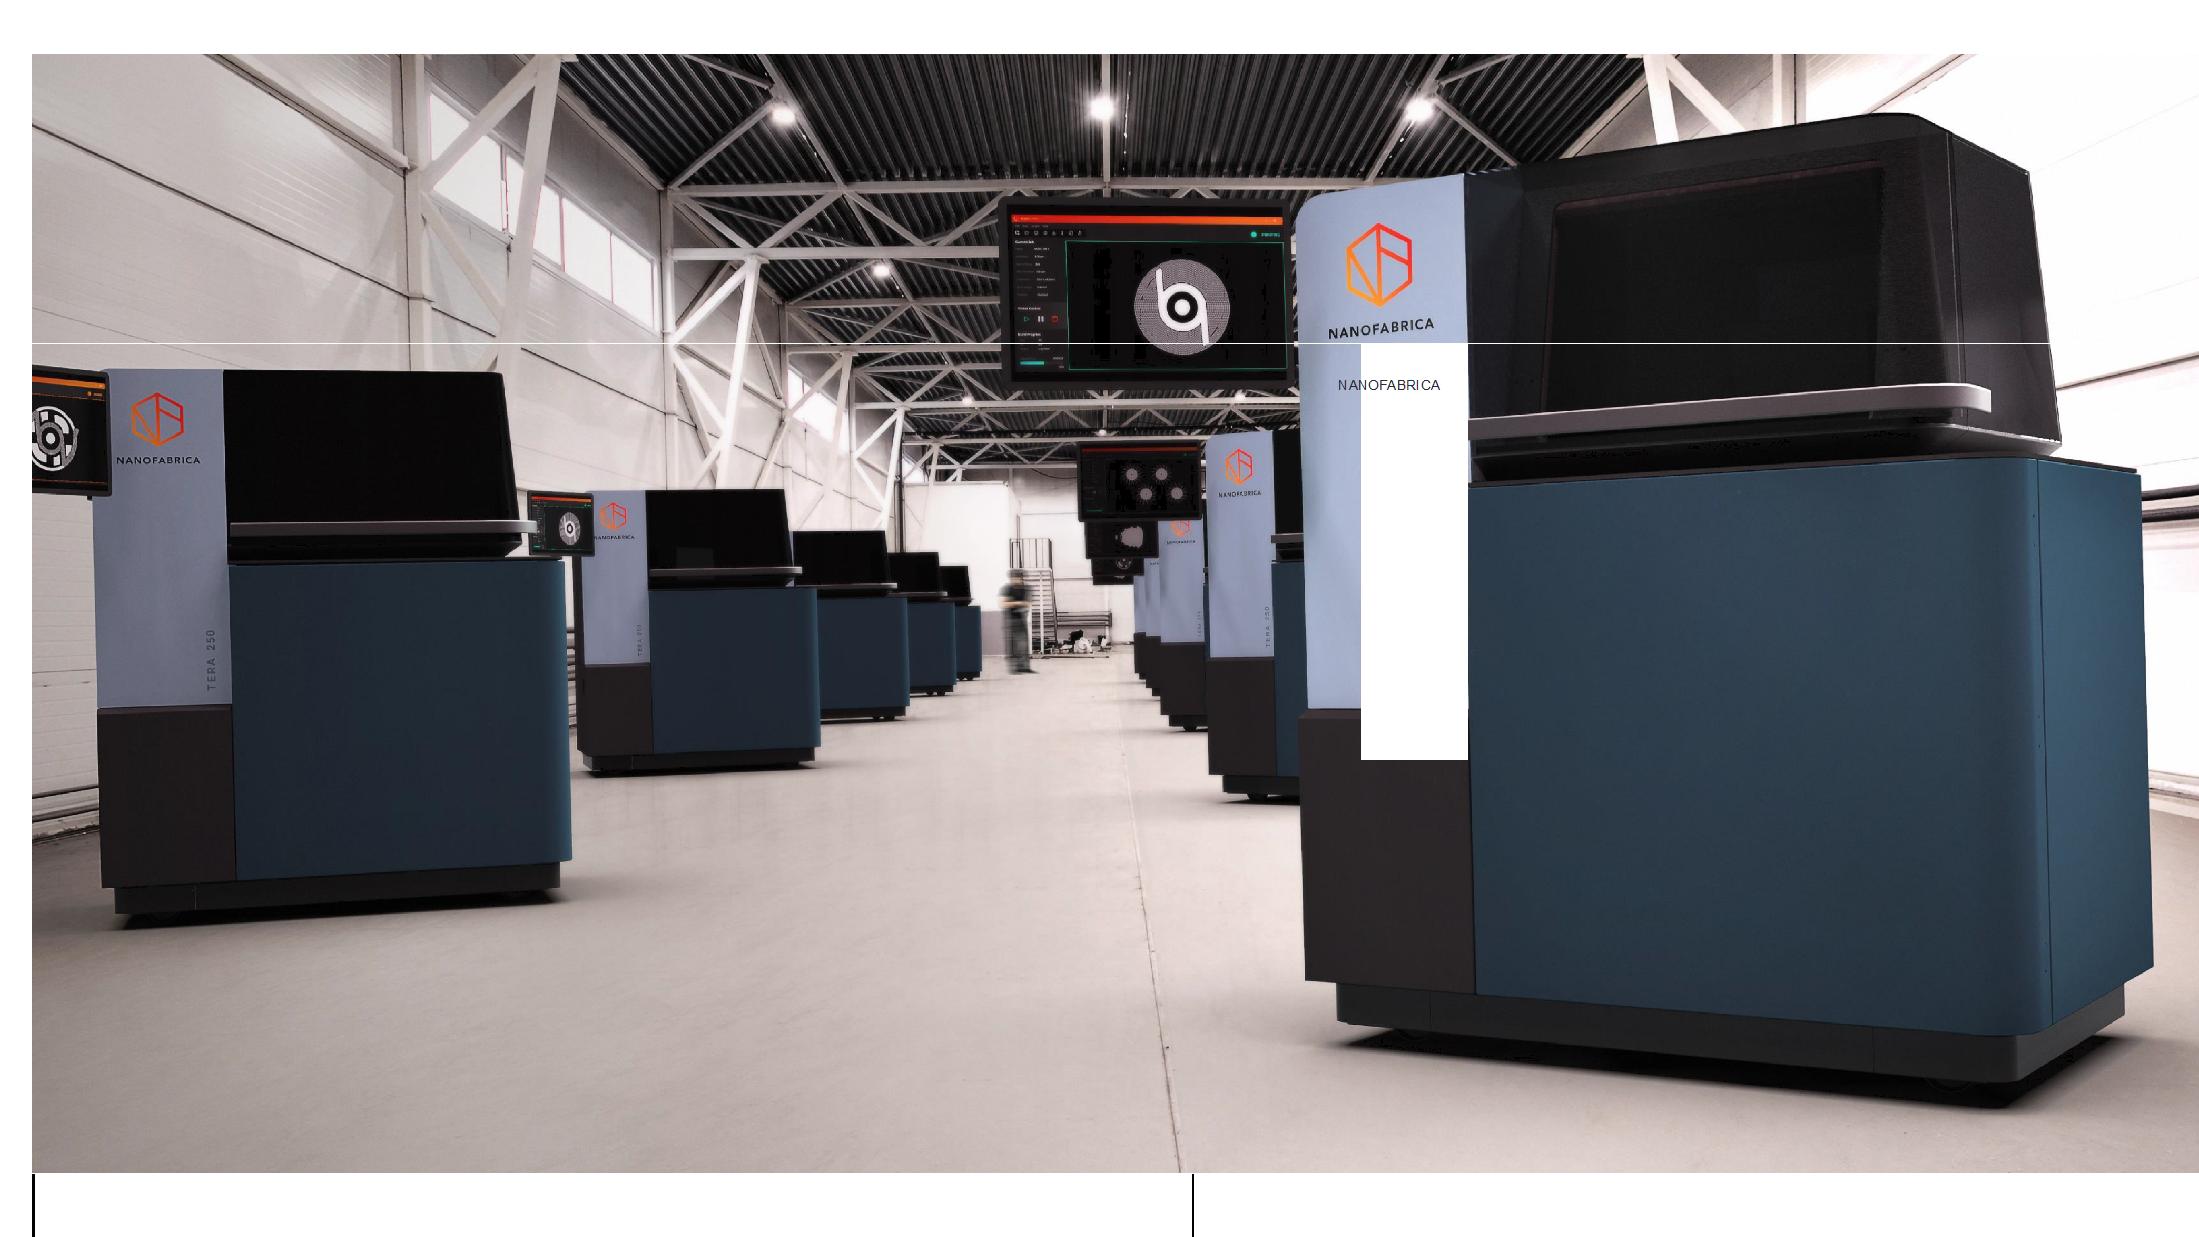 A fleet of Nanofabrica Tera 250 3D printers. Photo via Idan Gill/Nanofabrica.